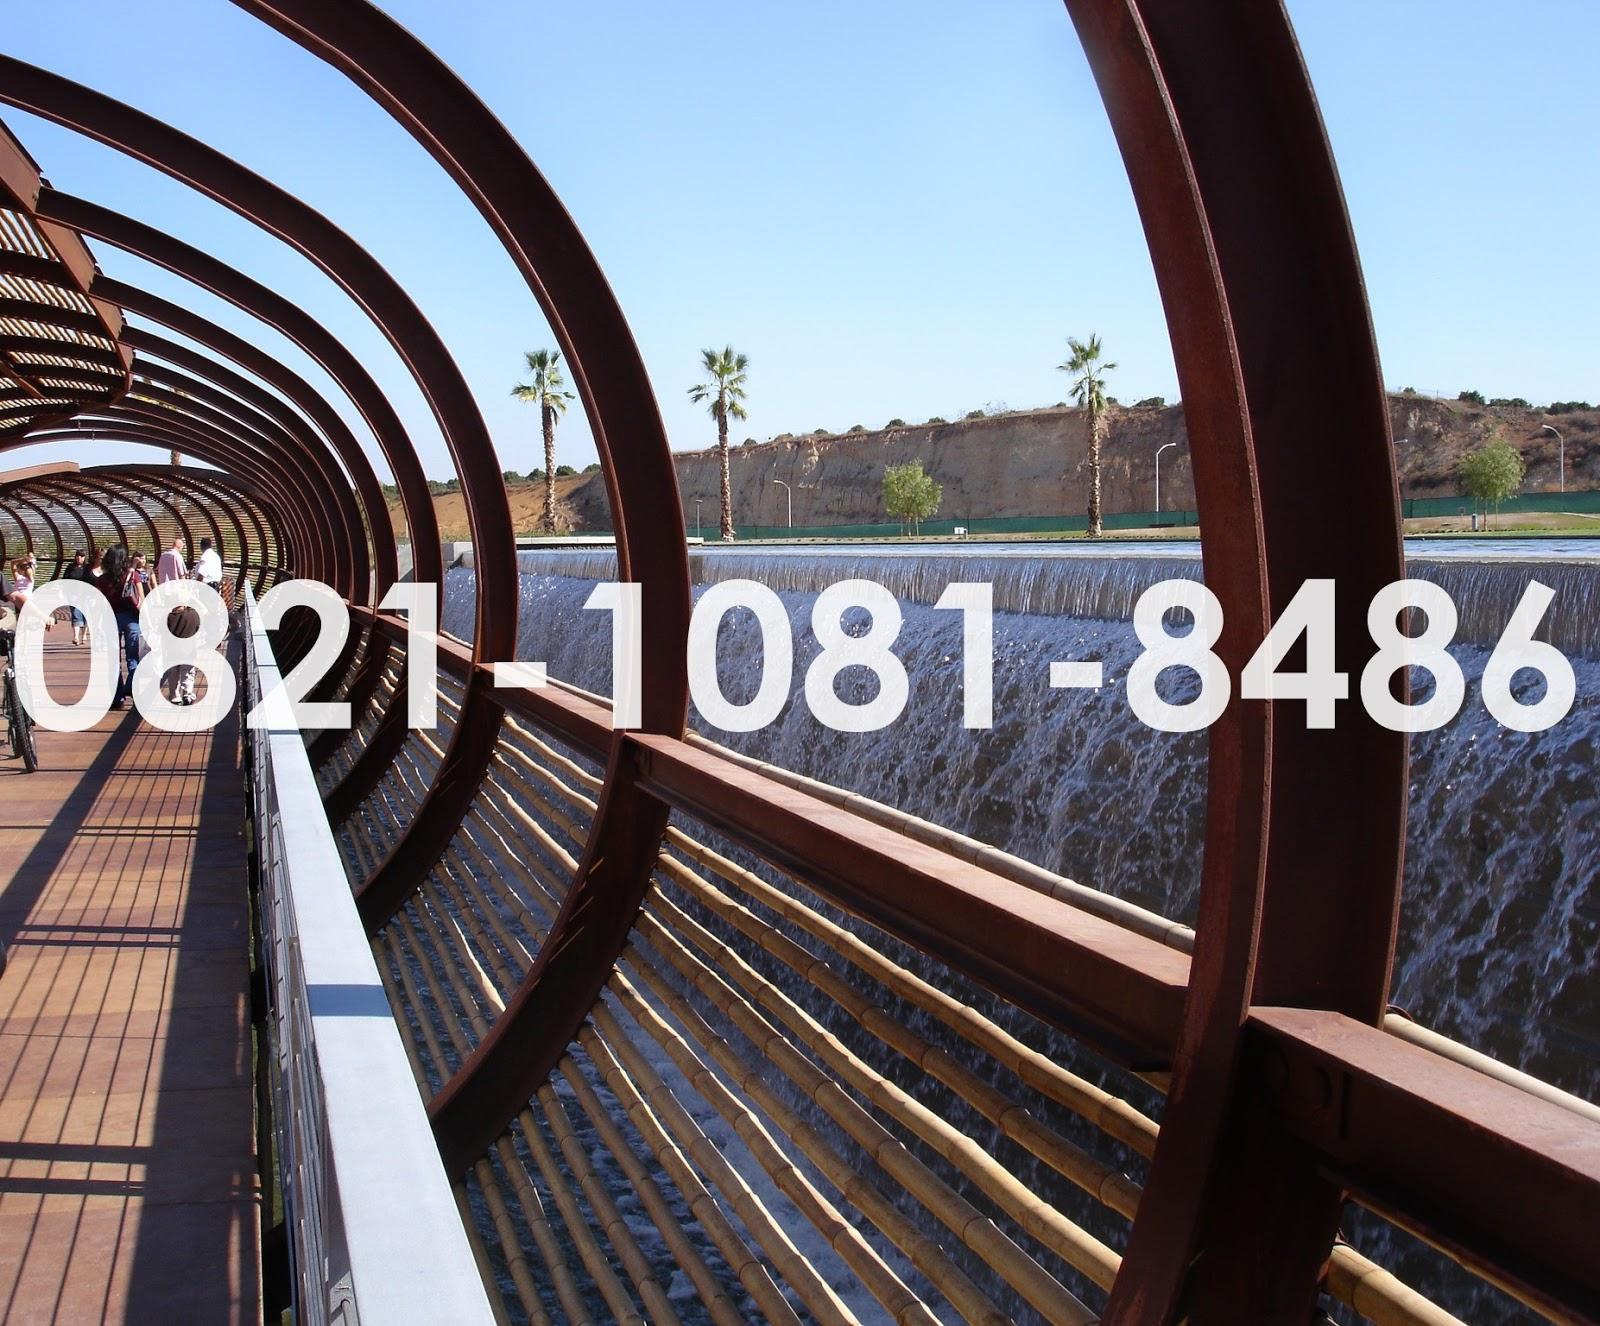 Jasa Steel Rib Tunnel Harga Murah